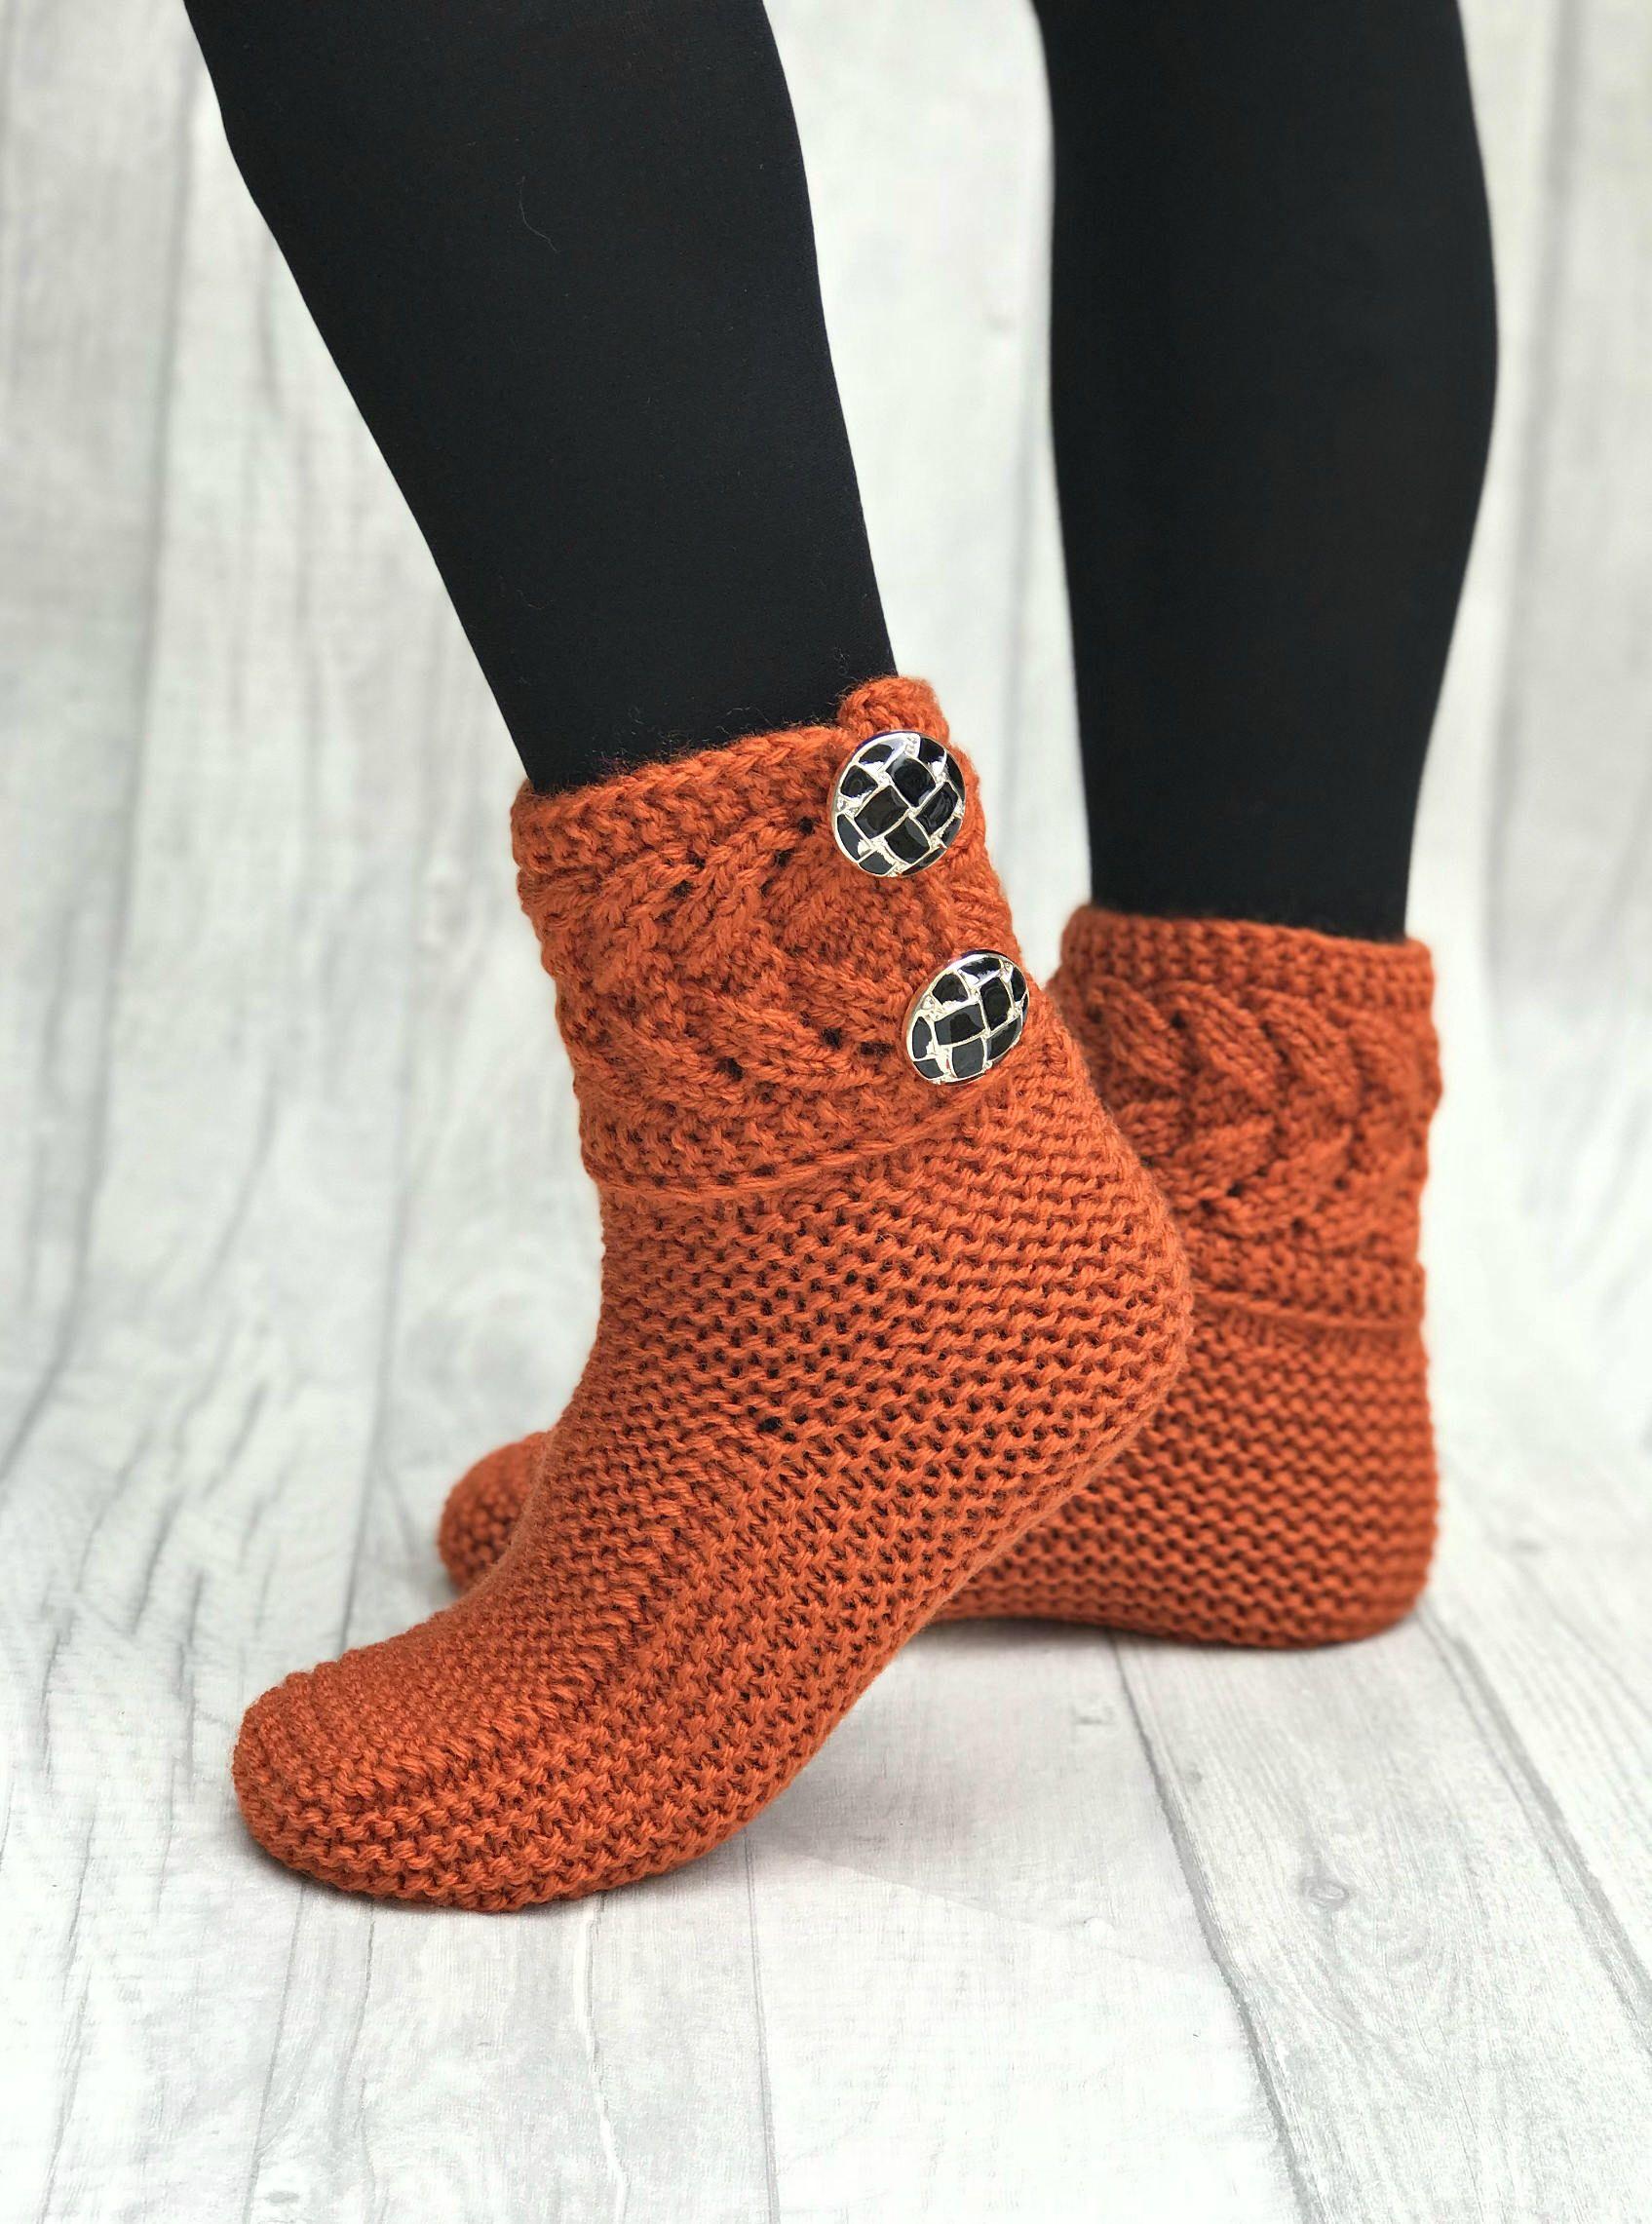 d46ed36d7a303 Warm Hand Knits - Warm Socks - Warm Cozy - Hand Knitted Socks - Hand ...